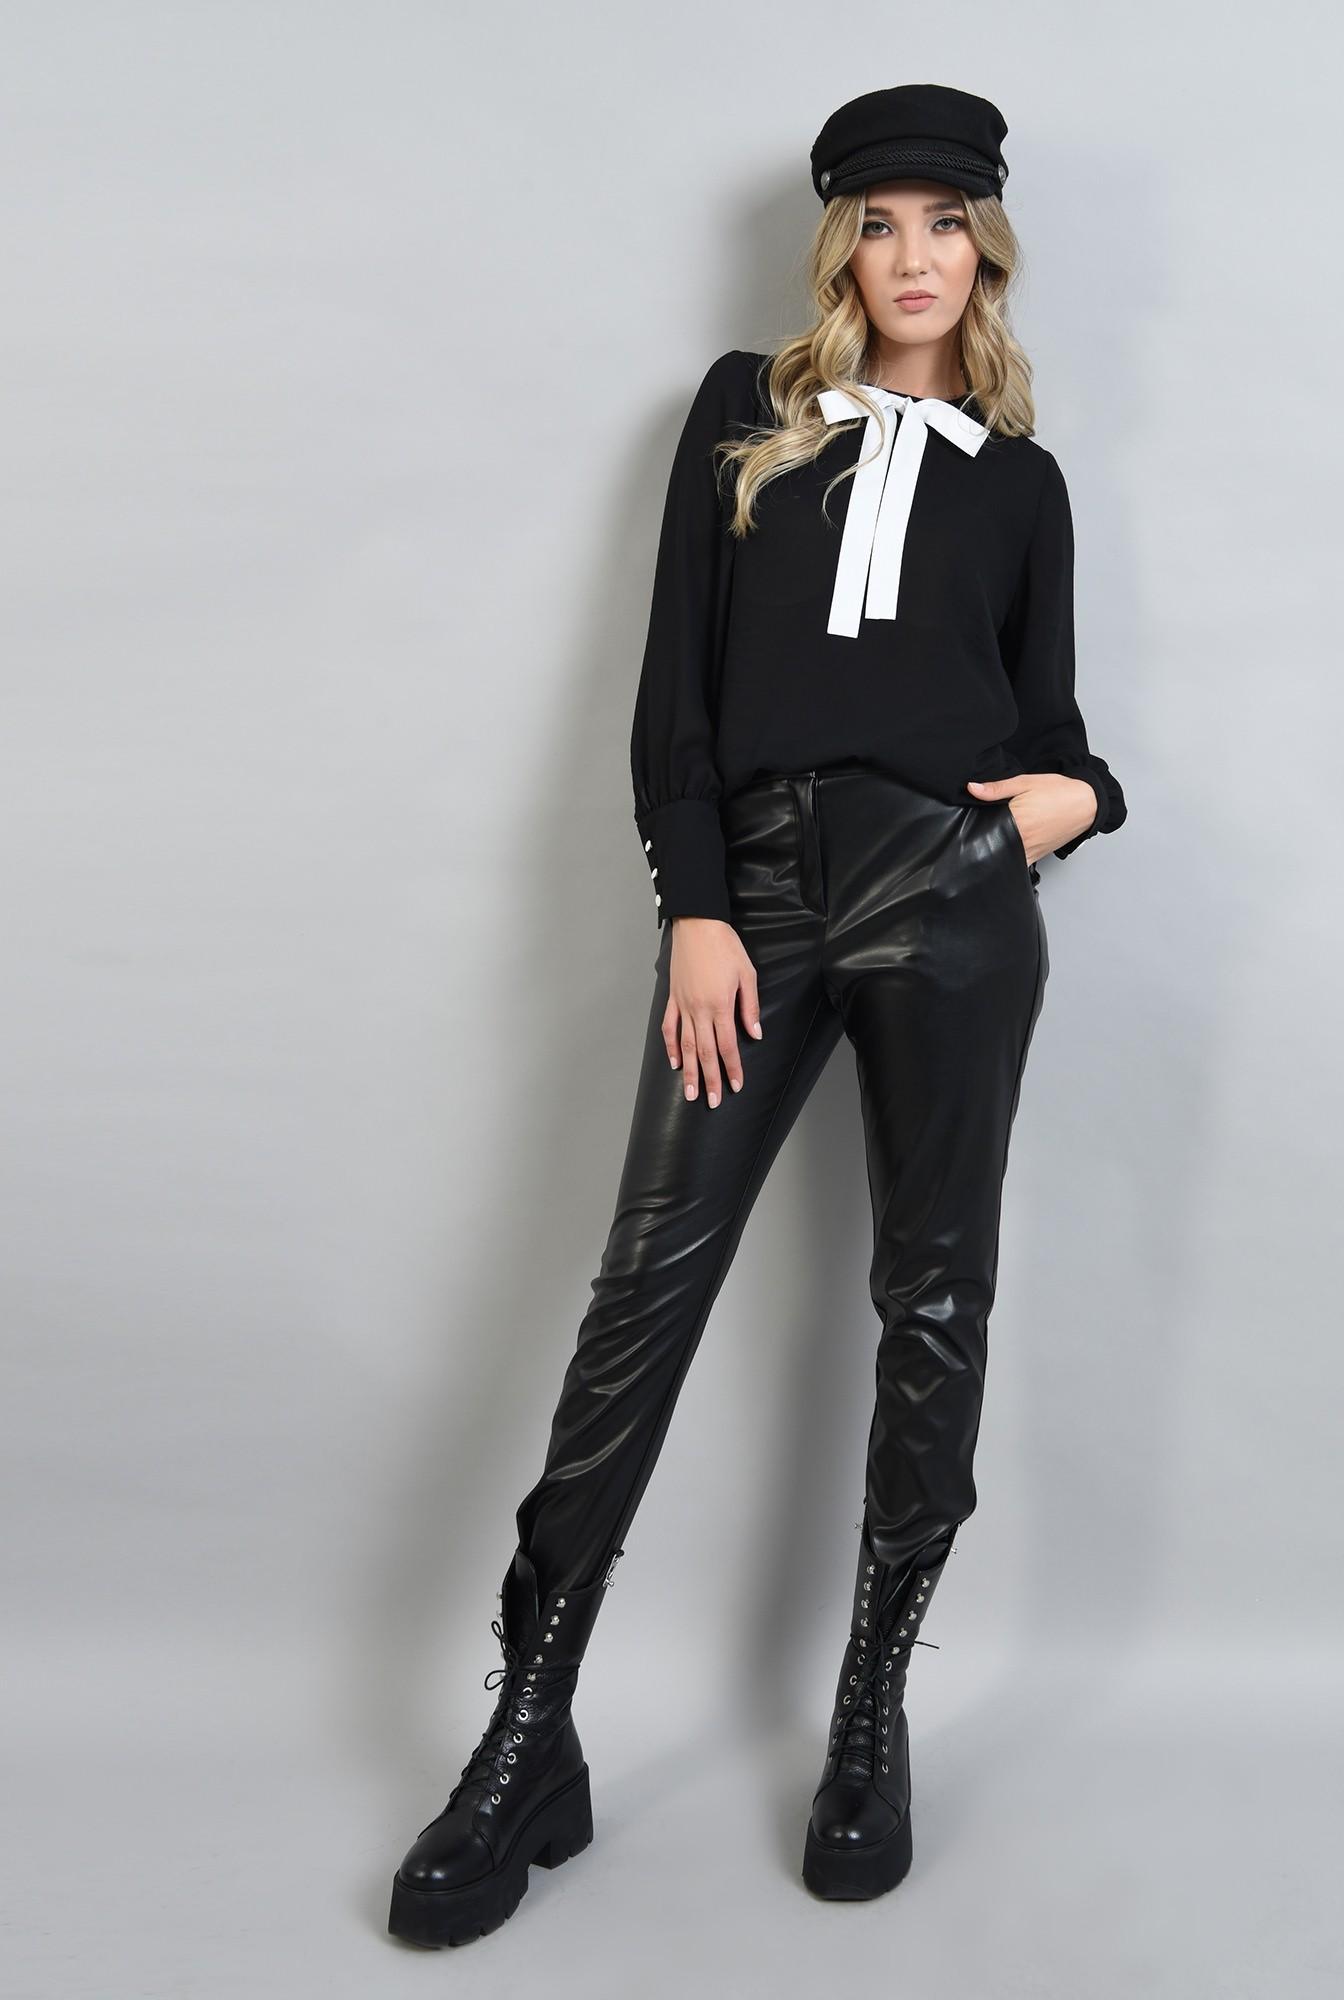 0 - bluza neagra, lejera, cu maneca lunga